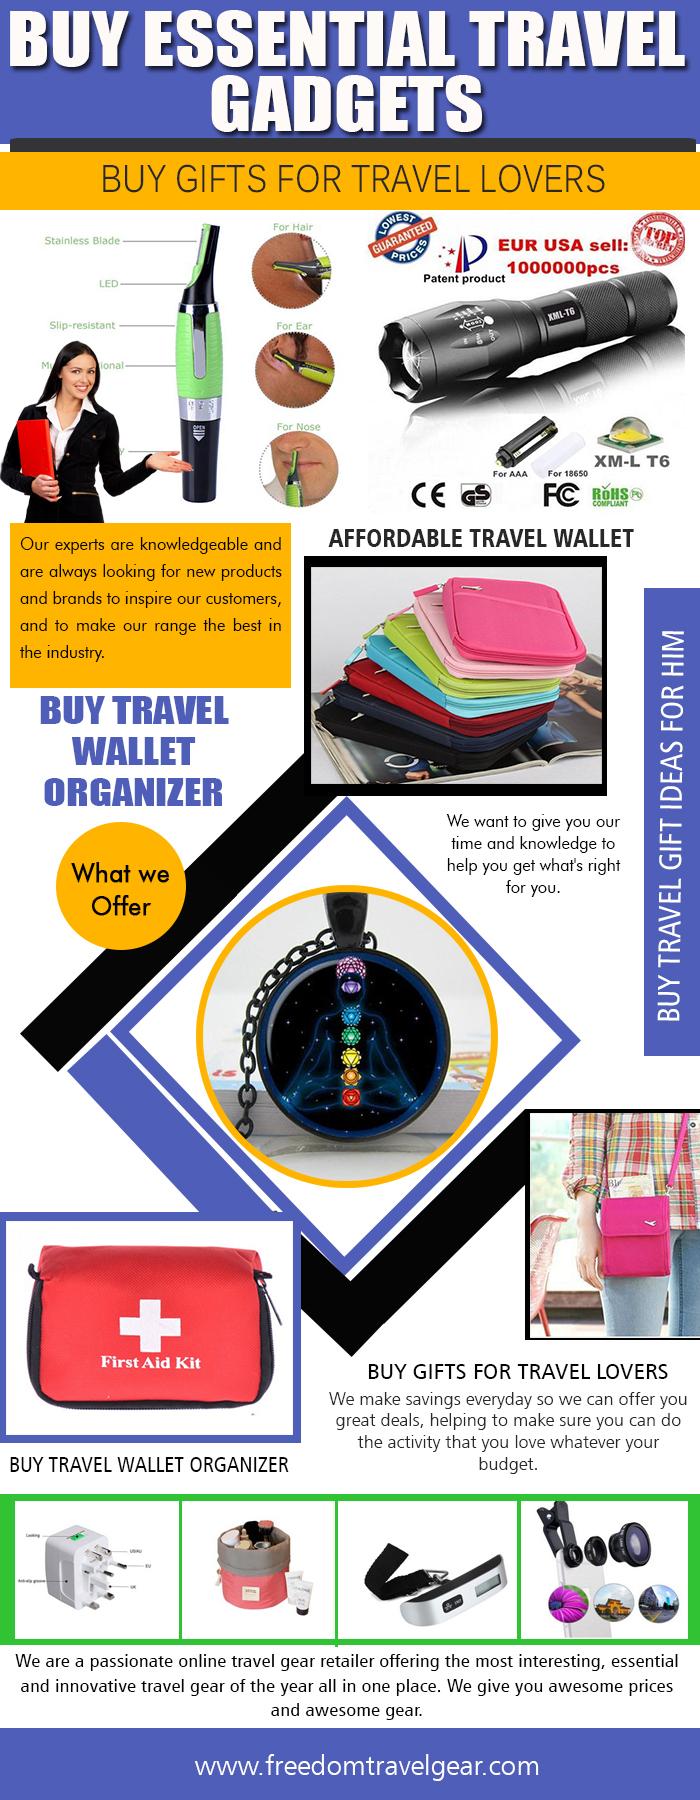 Buy Essential Travel Gadgets